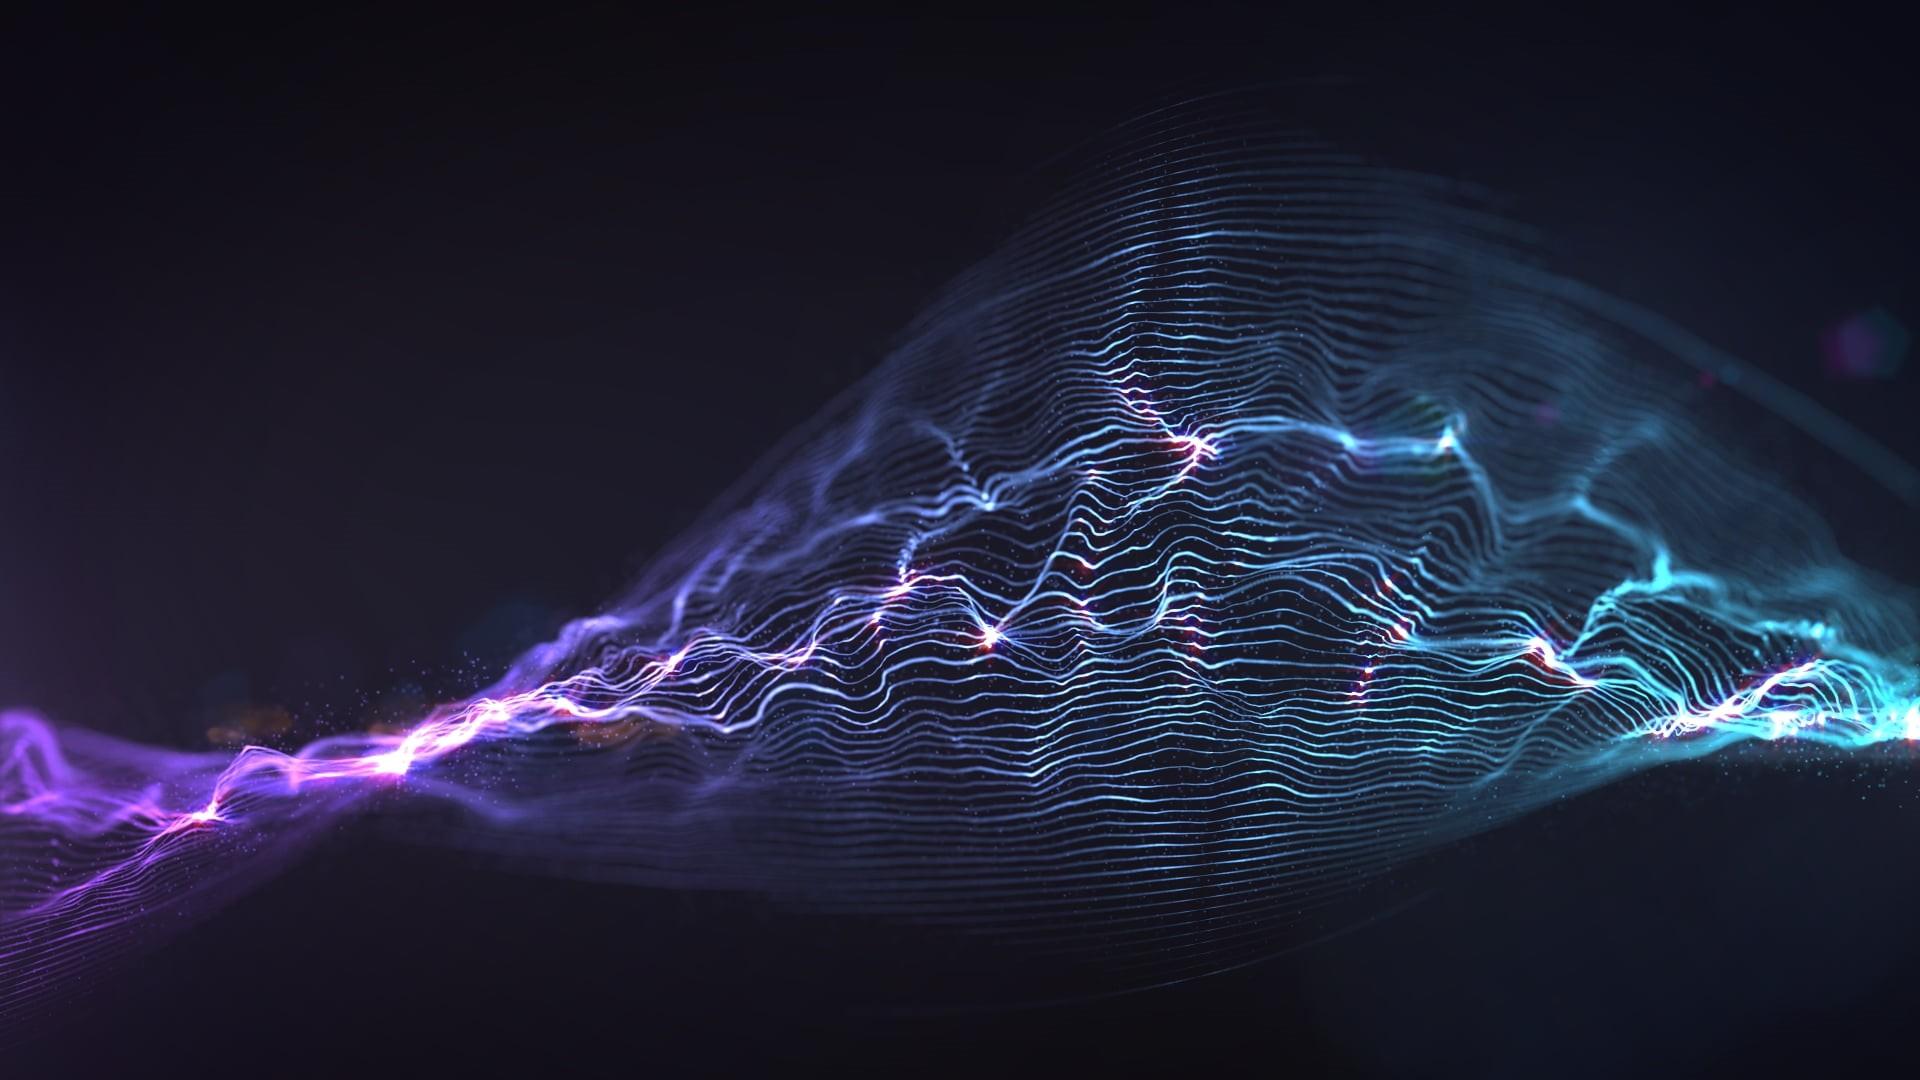 Electric wallpaper